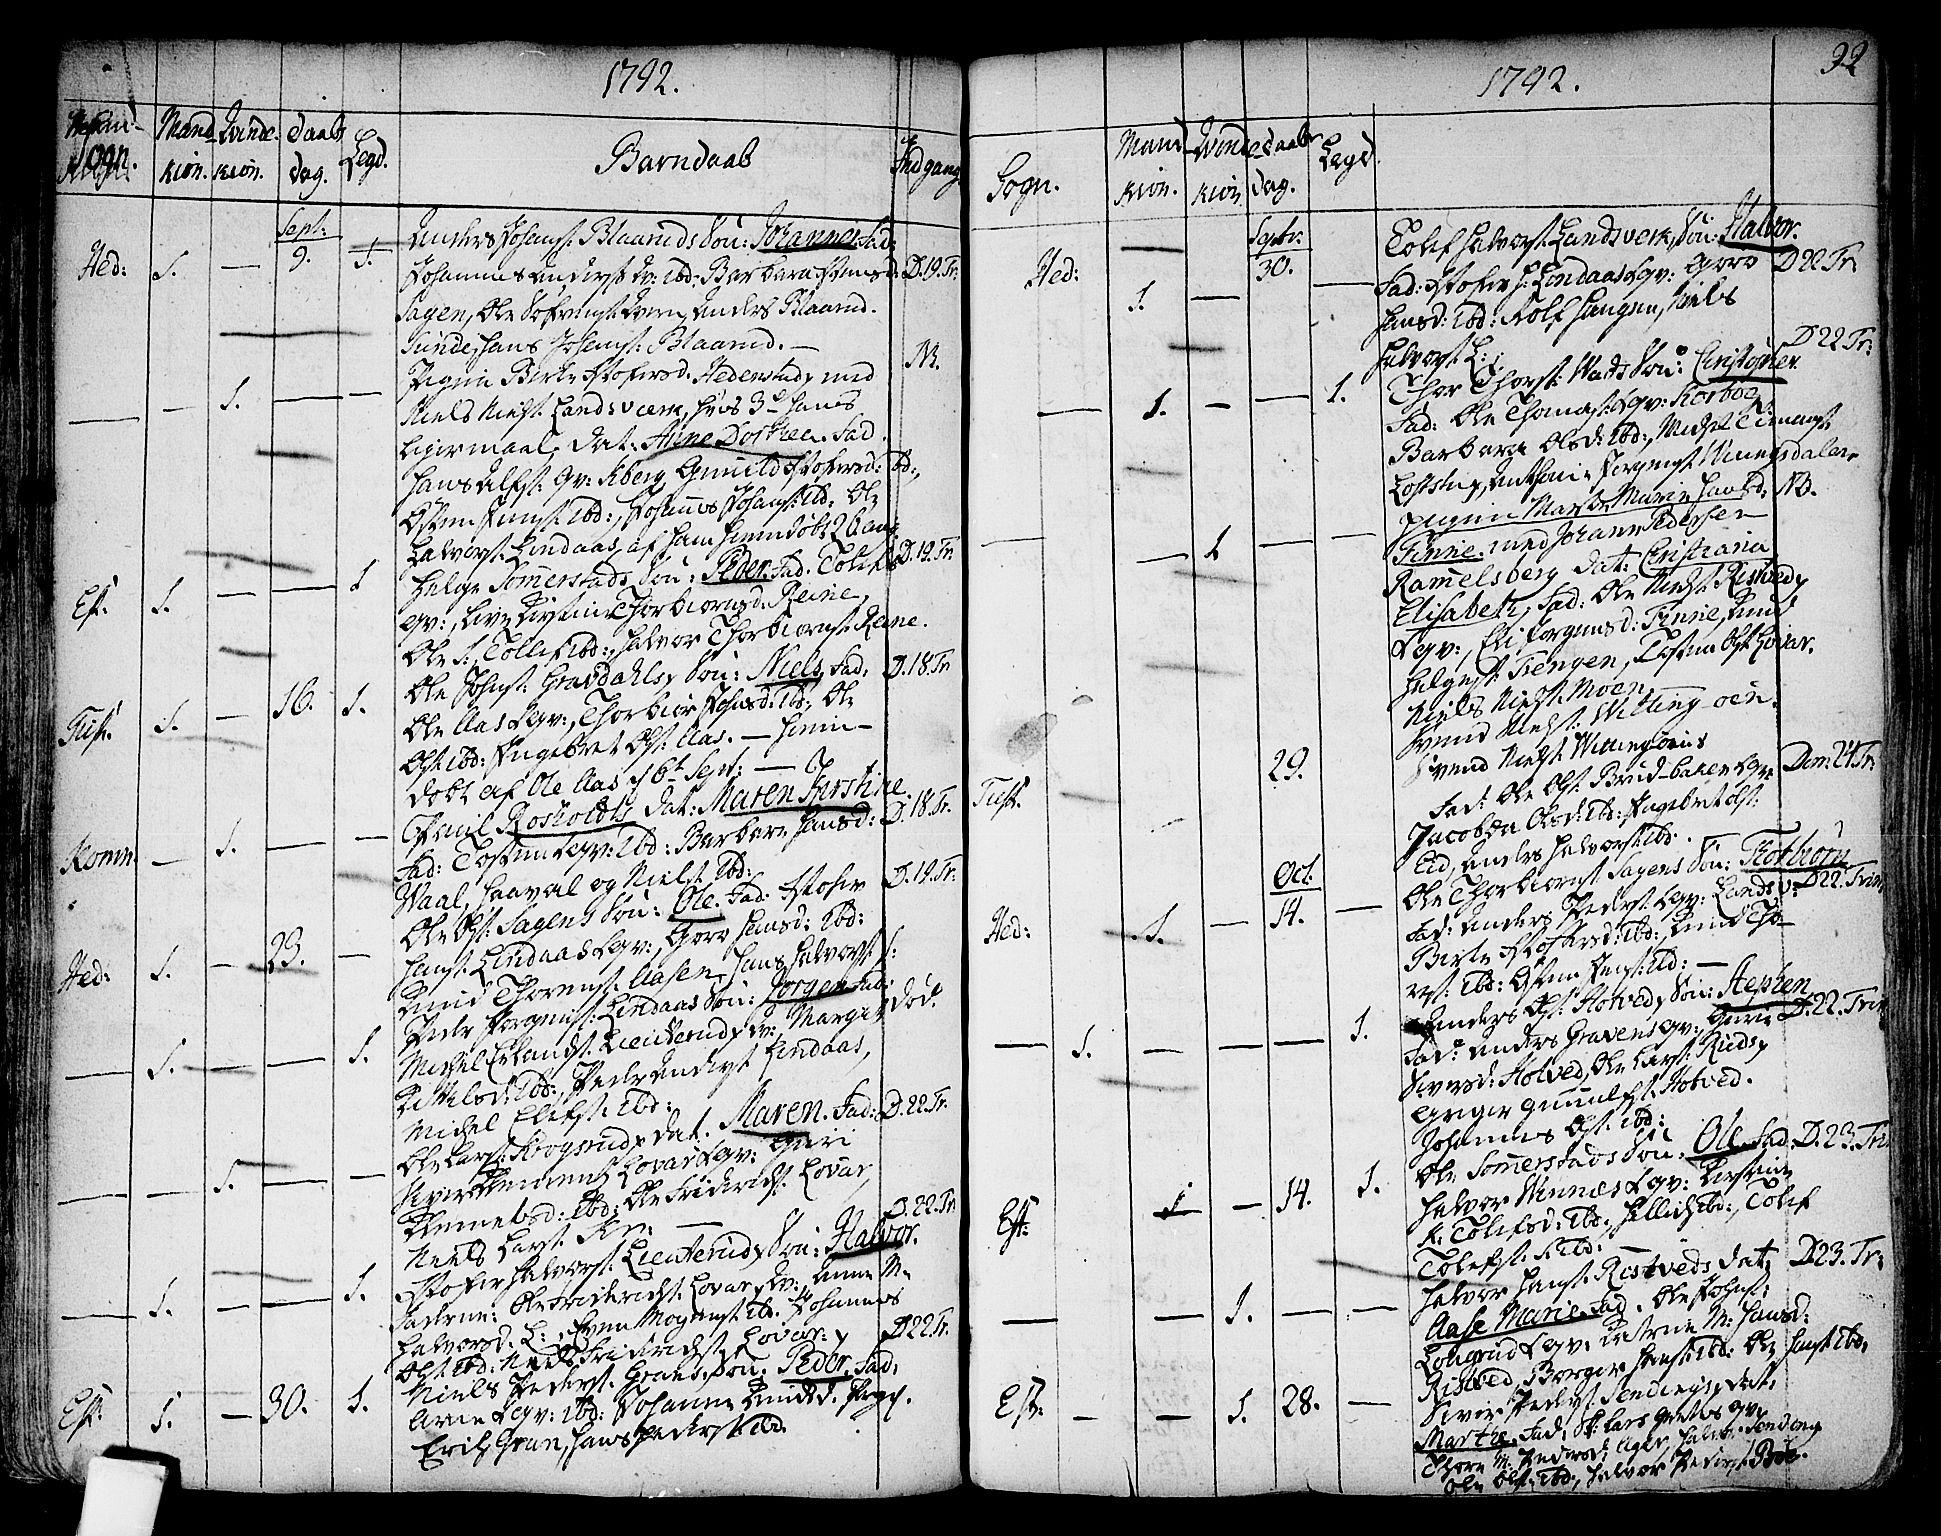 SAKO, Sandsvær kirkebøker, F/Fa/L0002a: Ministerialbok nr. I 2, 1725-1809, s. 92